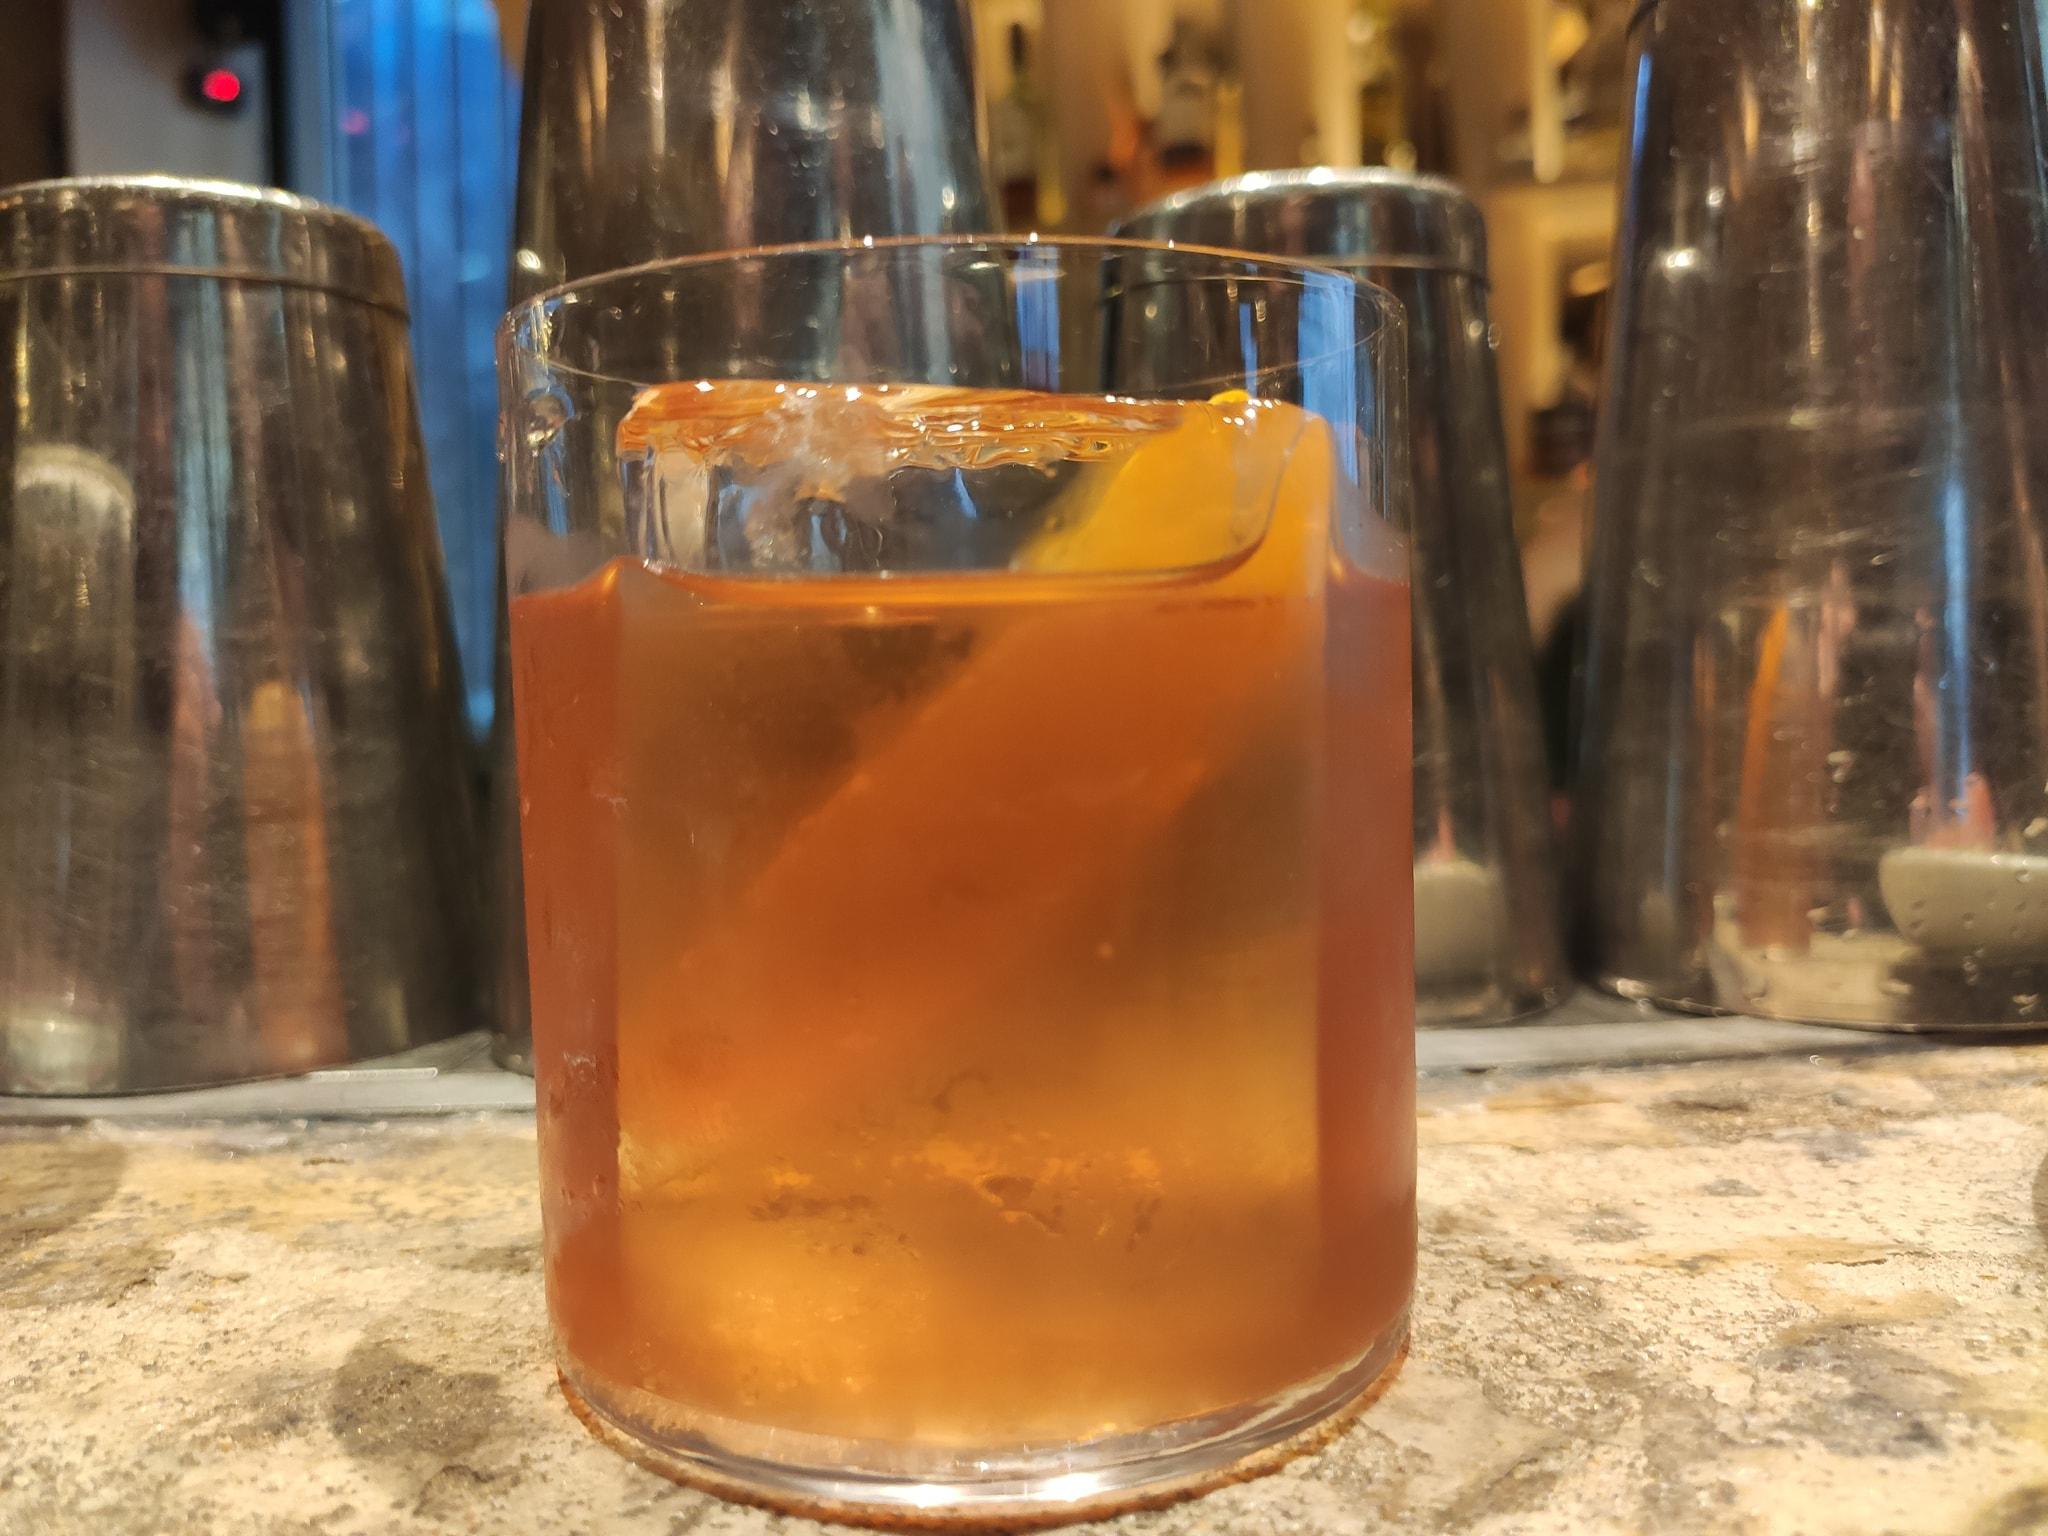 Ce cocktail préfigure celui qui sera servi à la pression au Gravity Bar.